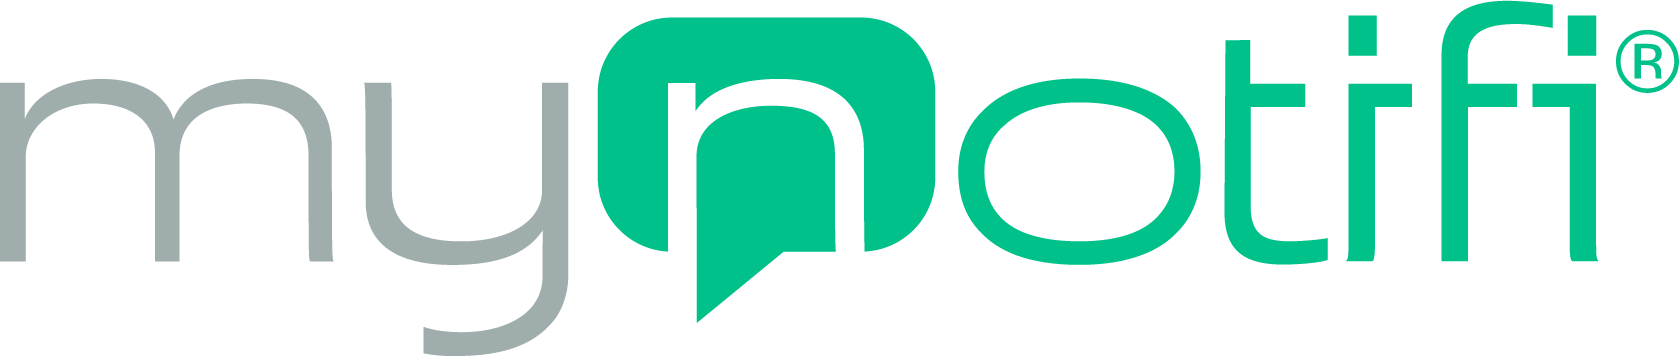 Mynotifi Fall Detection Amp Medical Alert Systems